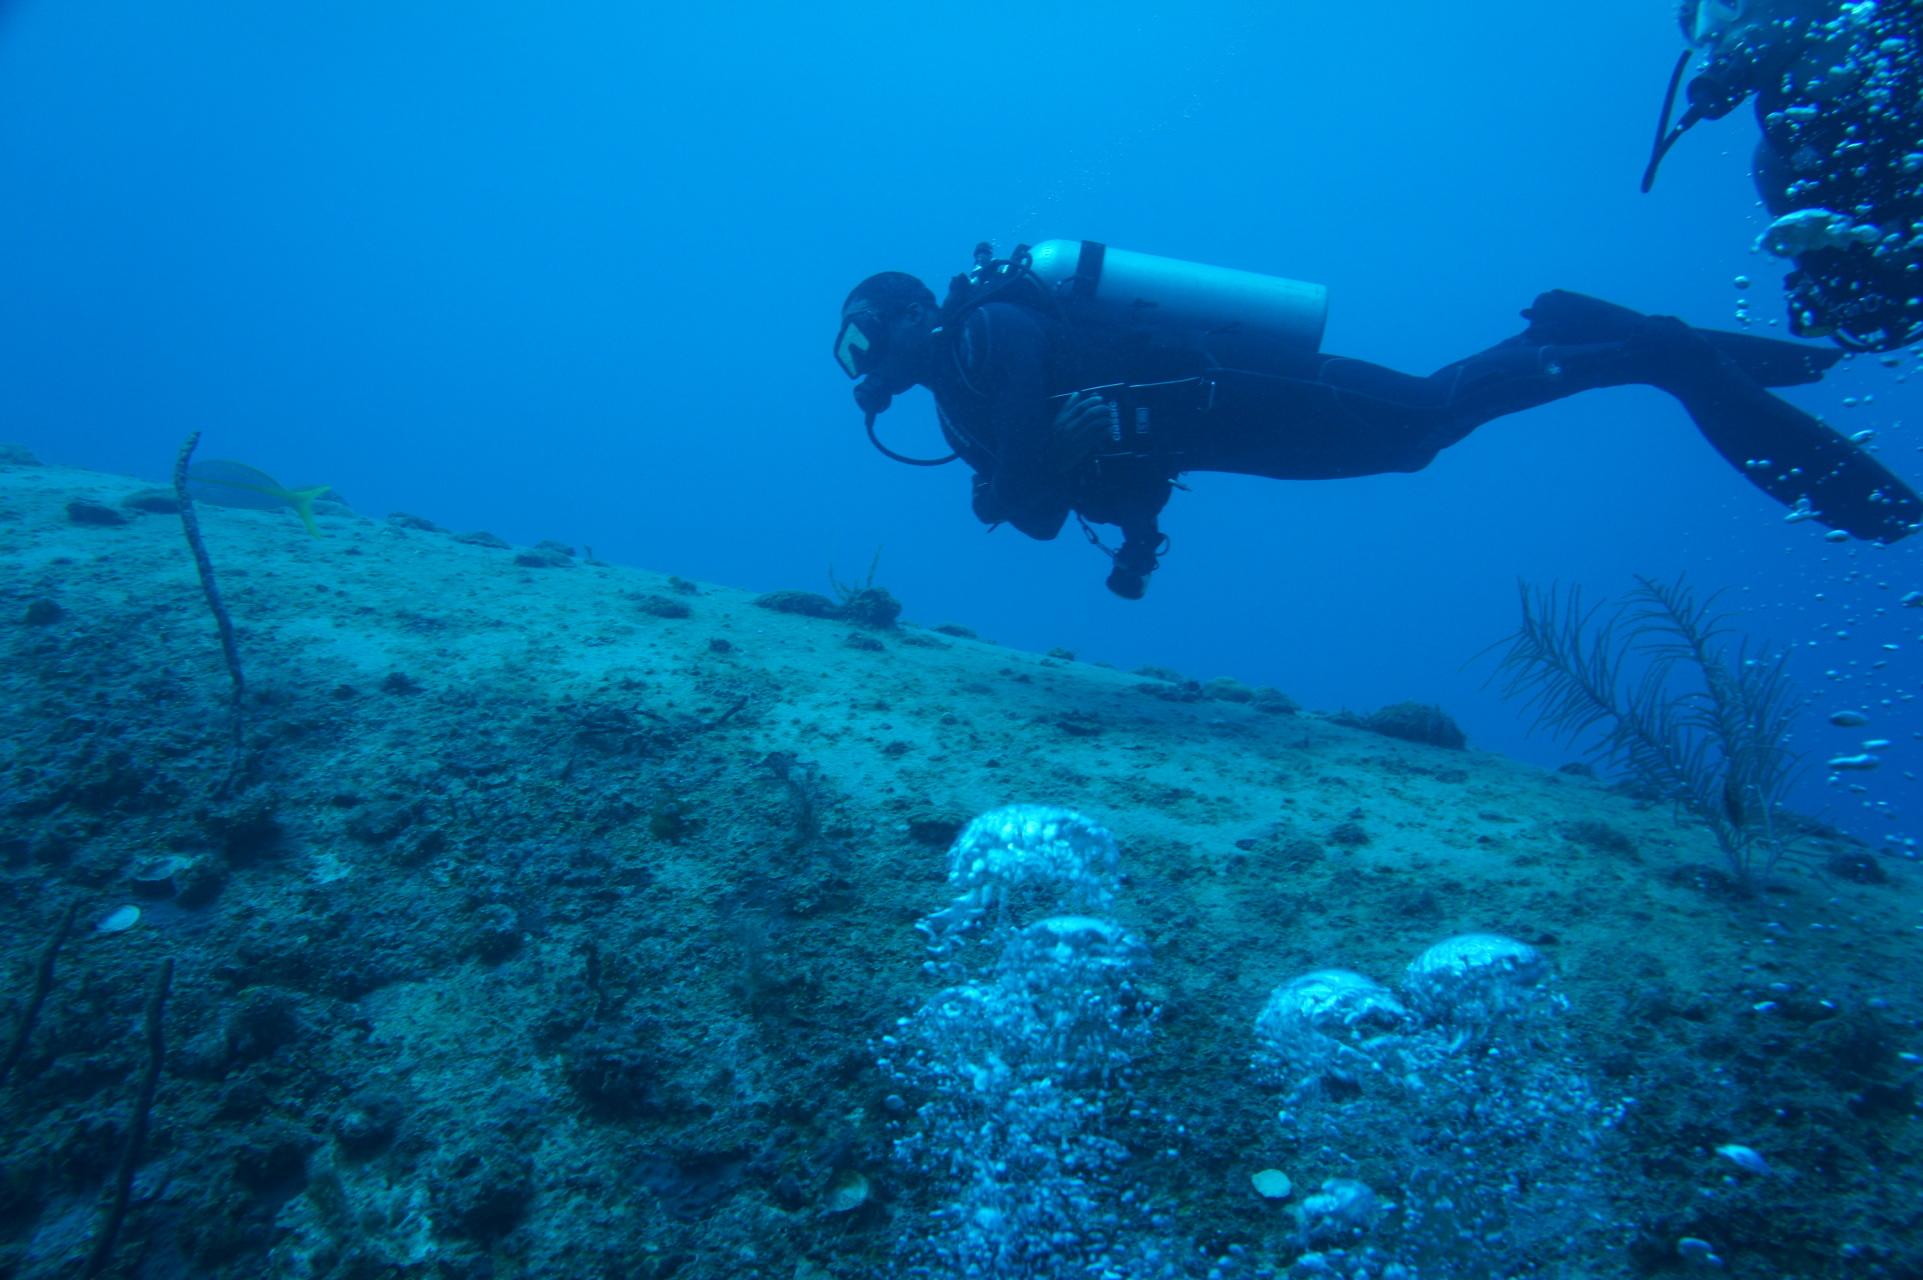 Diver ii the adventurist advanced scuba certification learn advanced scuba certification ii of ii raid 35 meters lake jocasselake keowee 1betcityfo Images